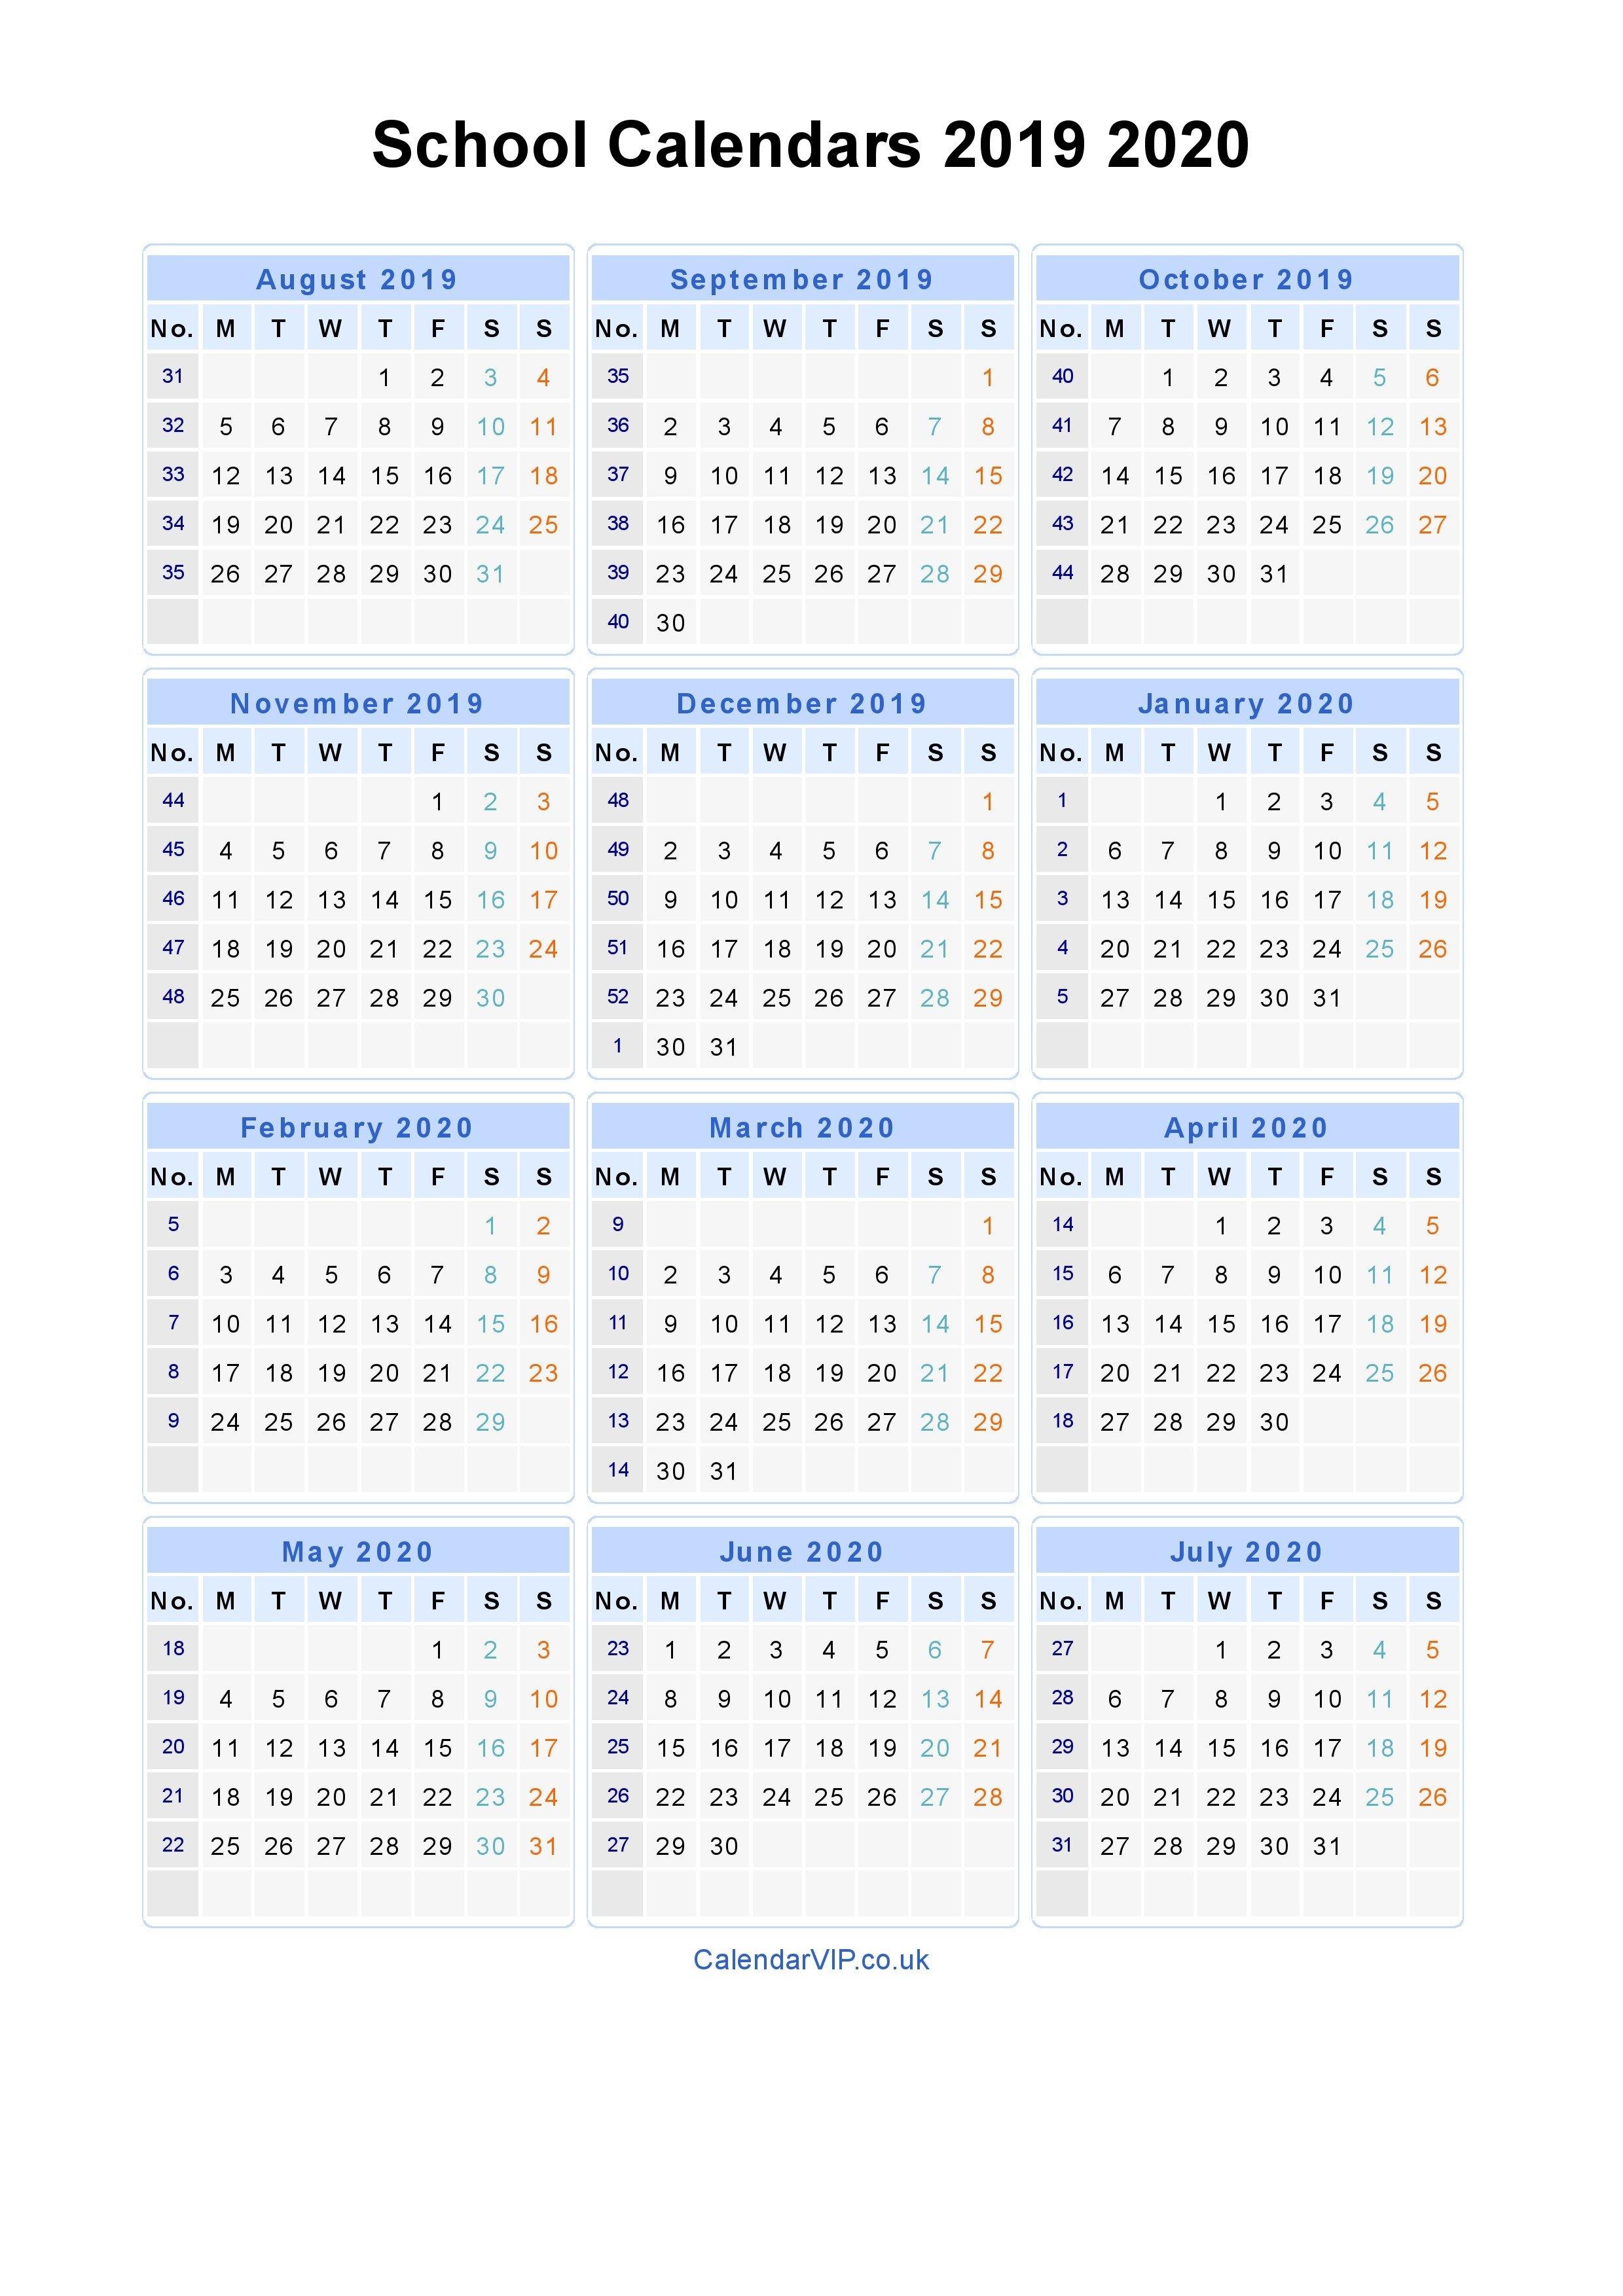 School Calendars 2019 2020 - Calendar From August 2019 To July 2020 4 Year Calendar 2019 To 2022